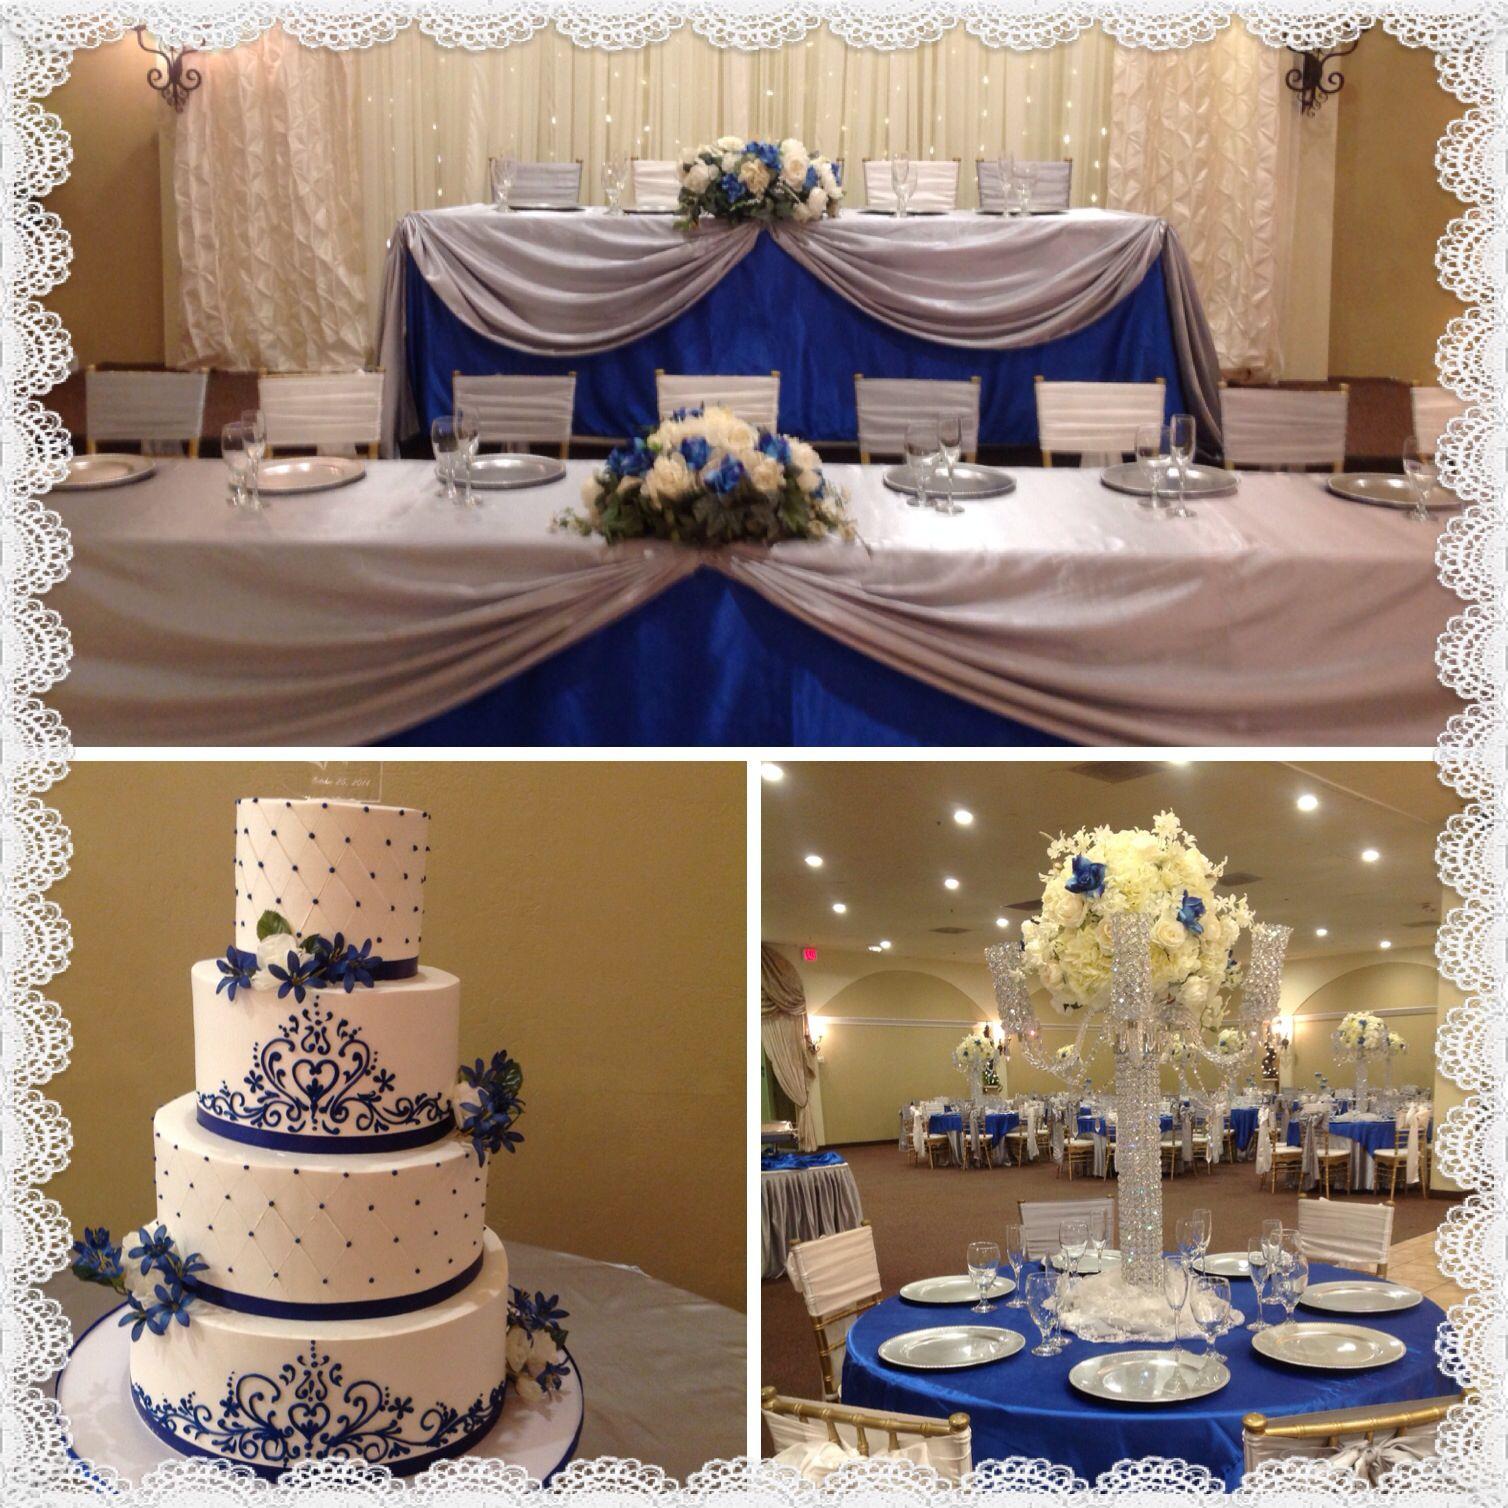 Wedding Decor In Royal Blue And Silver At Villatuscanareceptionhall